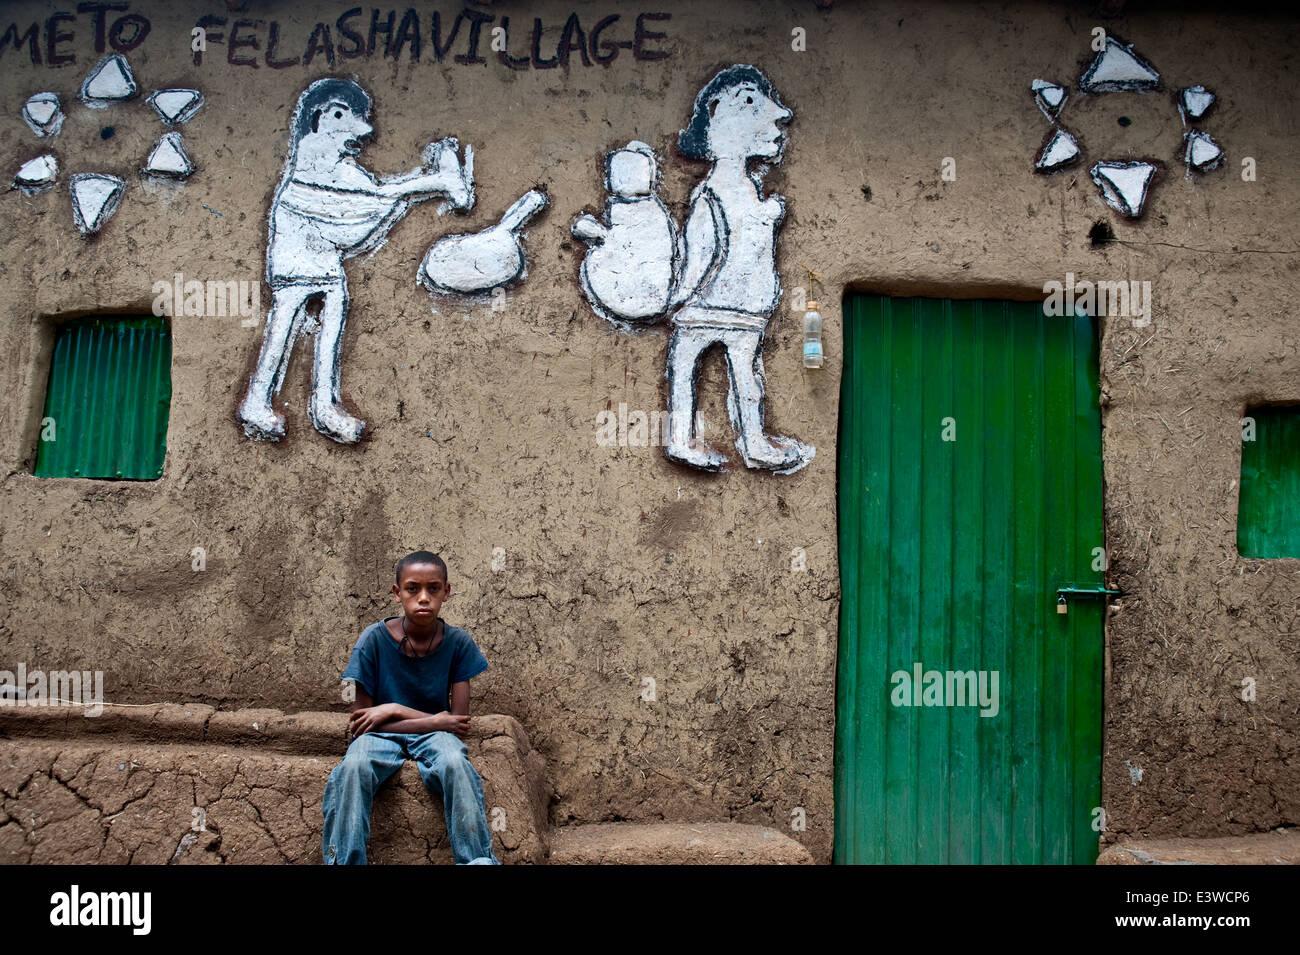 House in a former Falasha village ( Ethiopia) - Stock Image